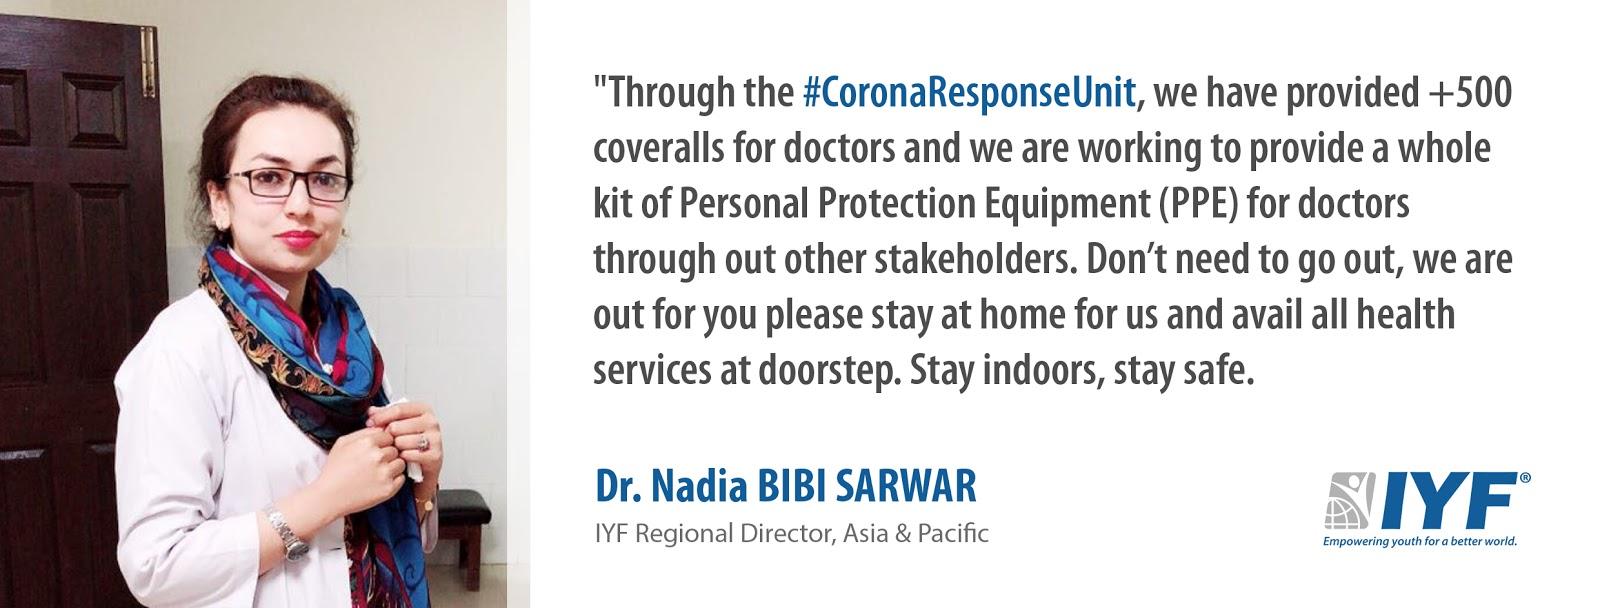 Dr. Nadia Bibi Sarwar, IYF Regional Director in Asia & Pacific